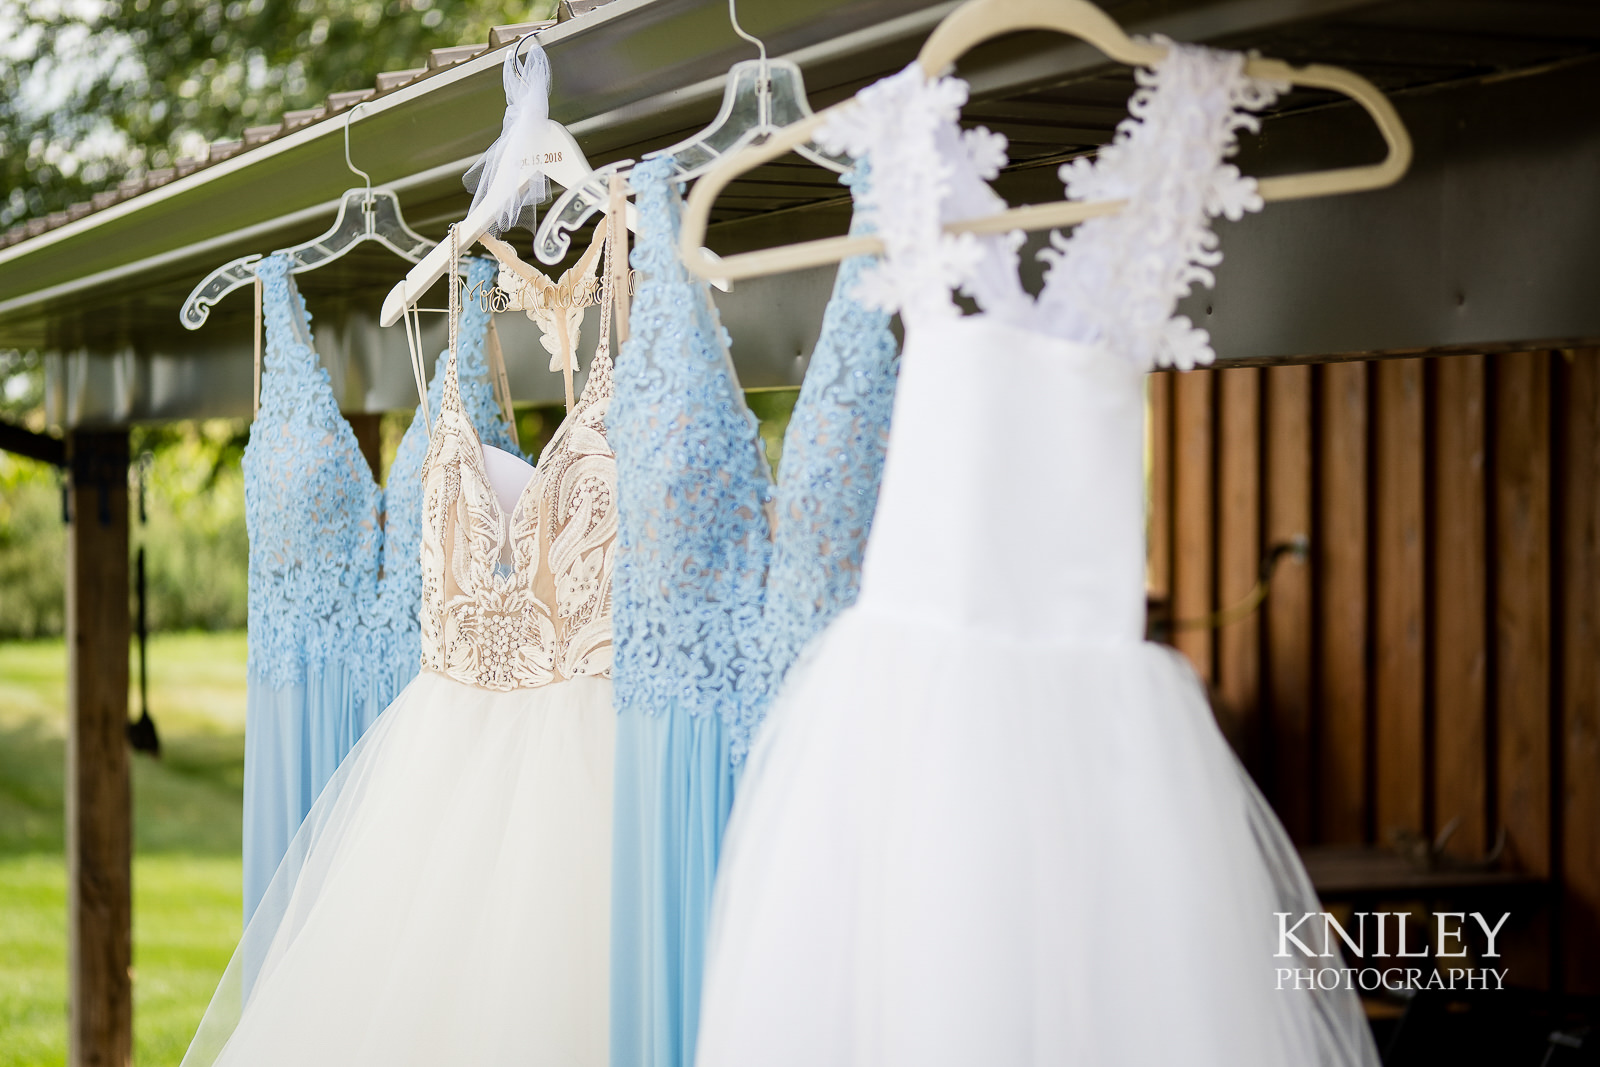 020 - Buffalo NY wedding - Preparation pictures - XT2B8250.jpg